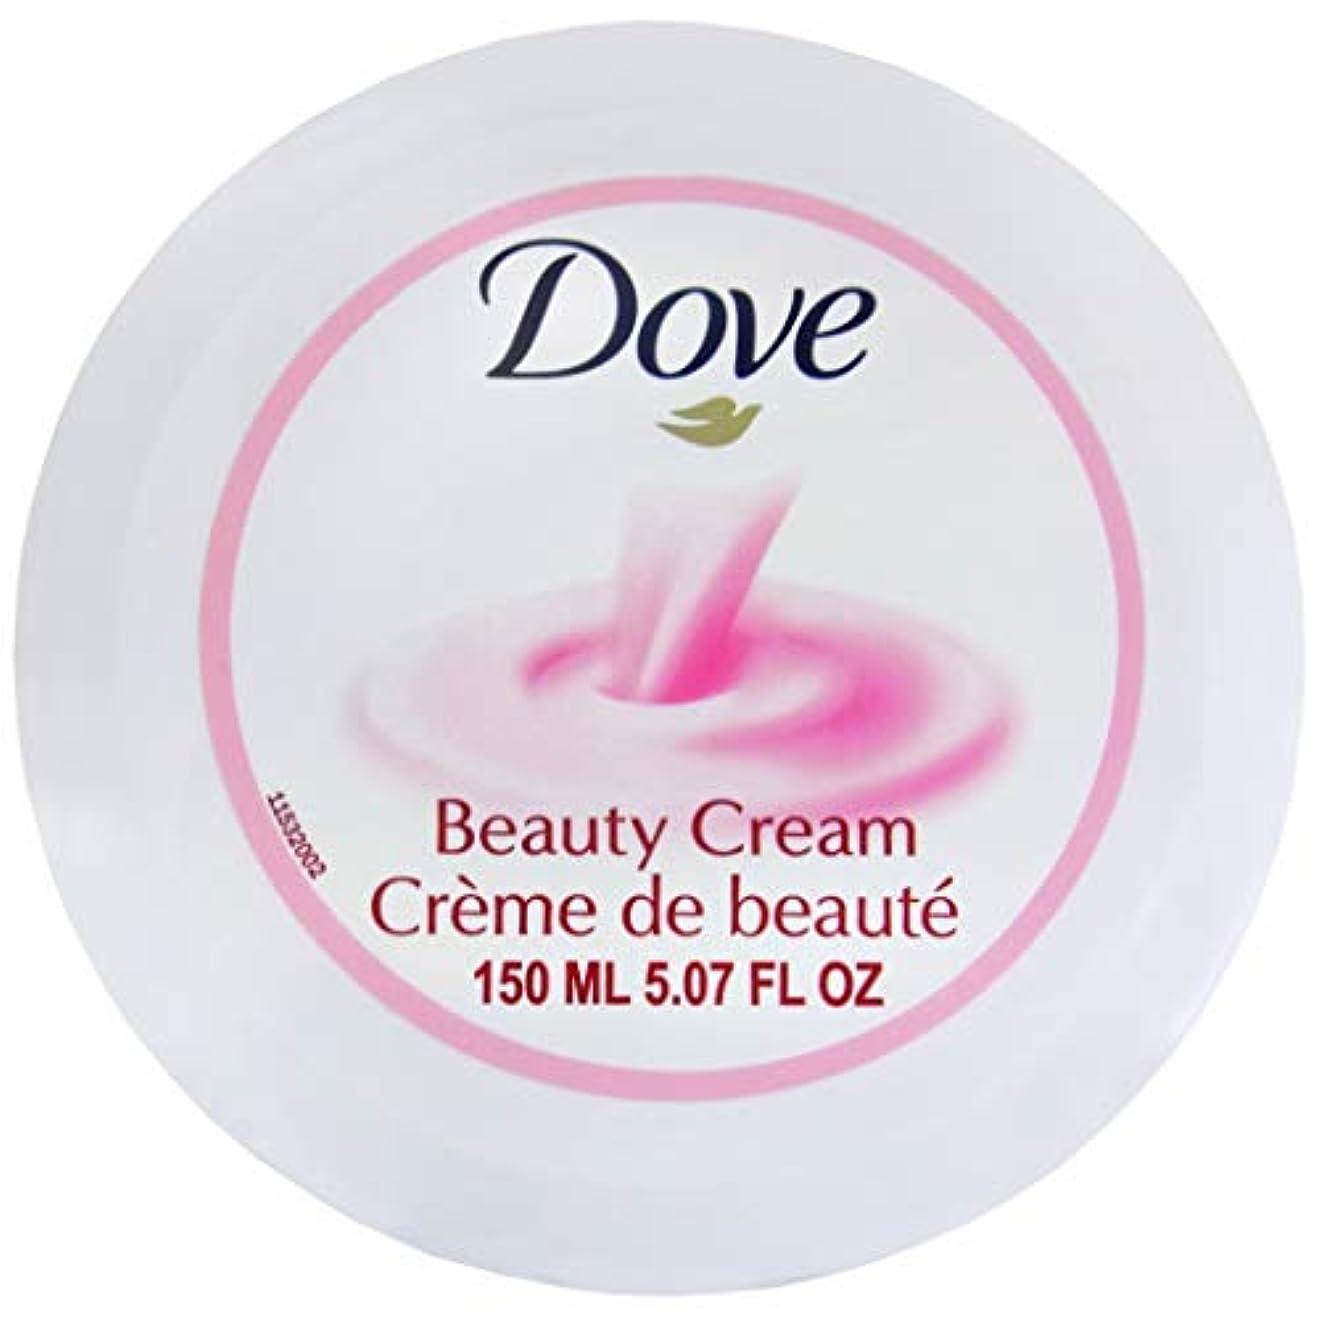 Dove(ダヴ) ビューティークリーム 〈全身用クリーム〉 (150mL)